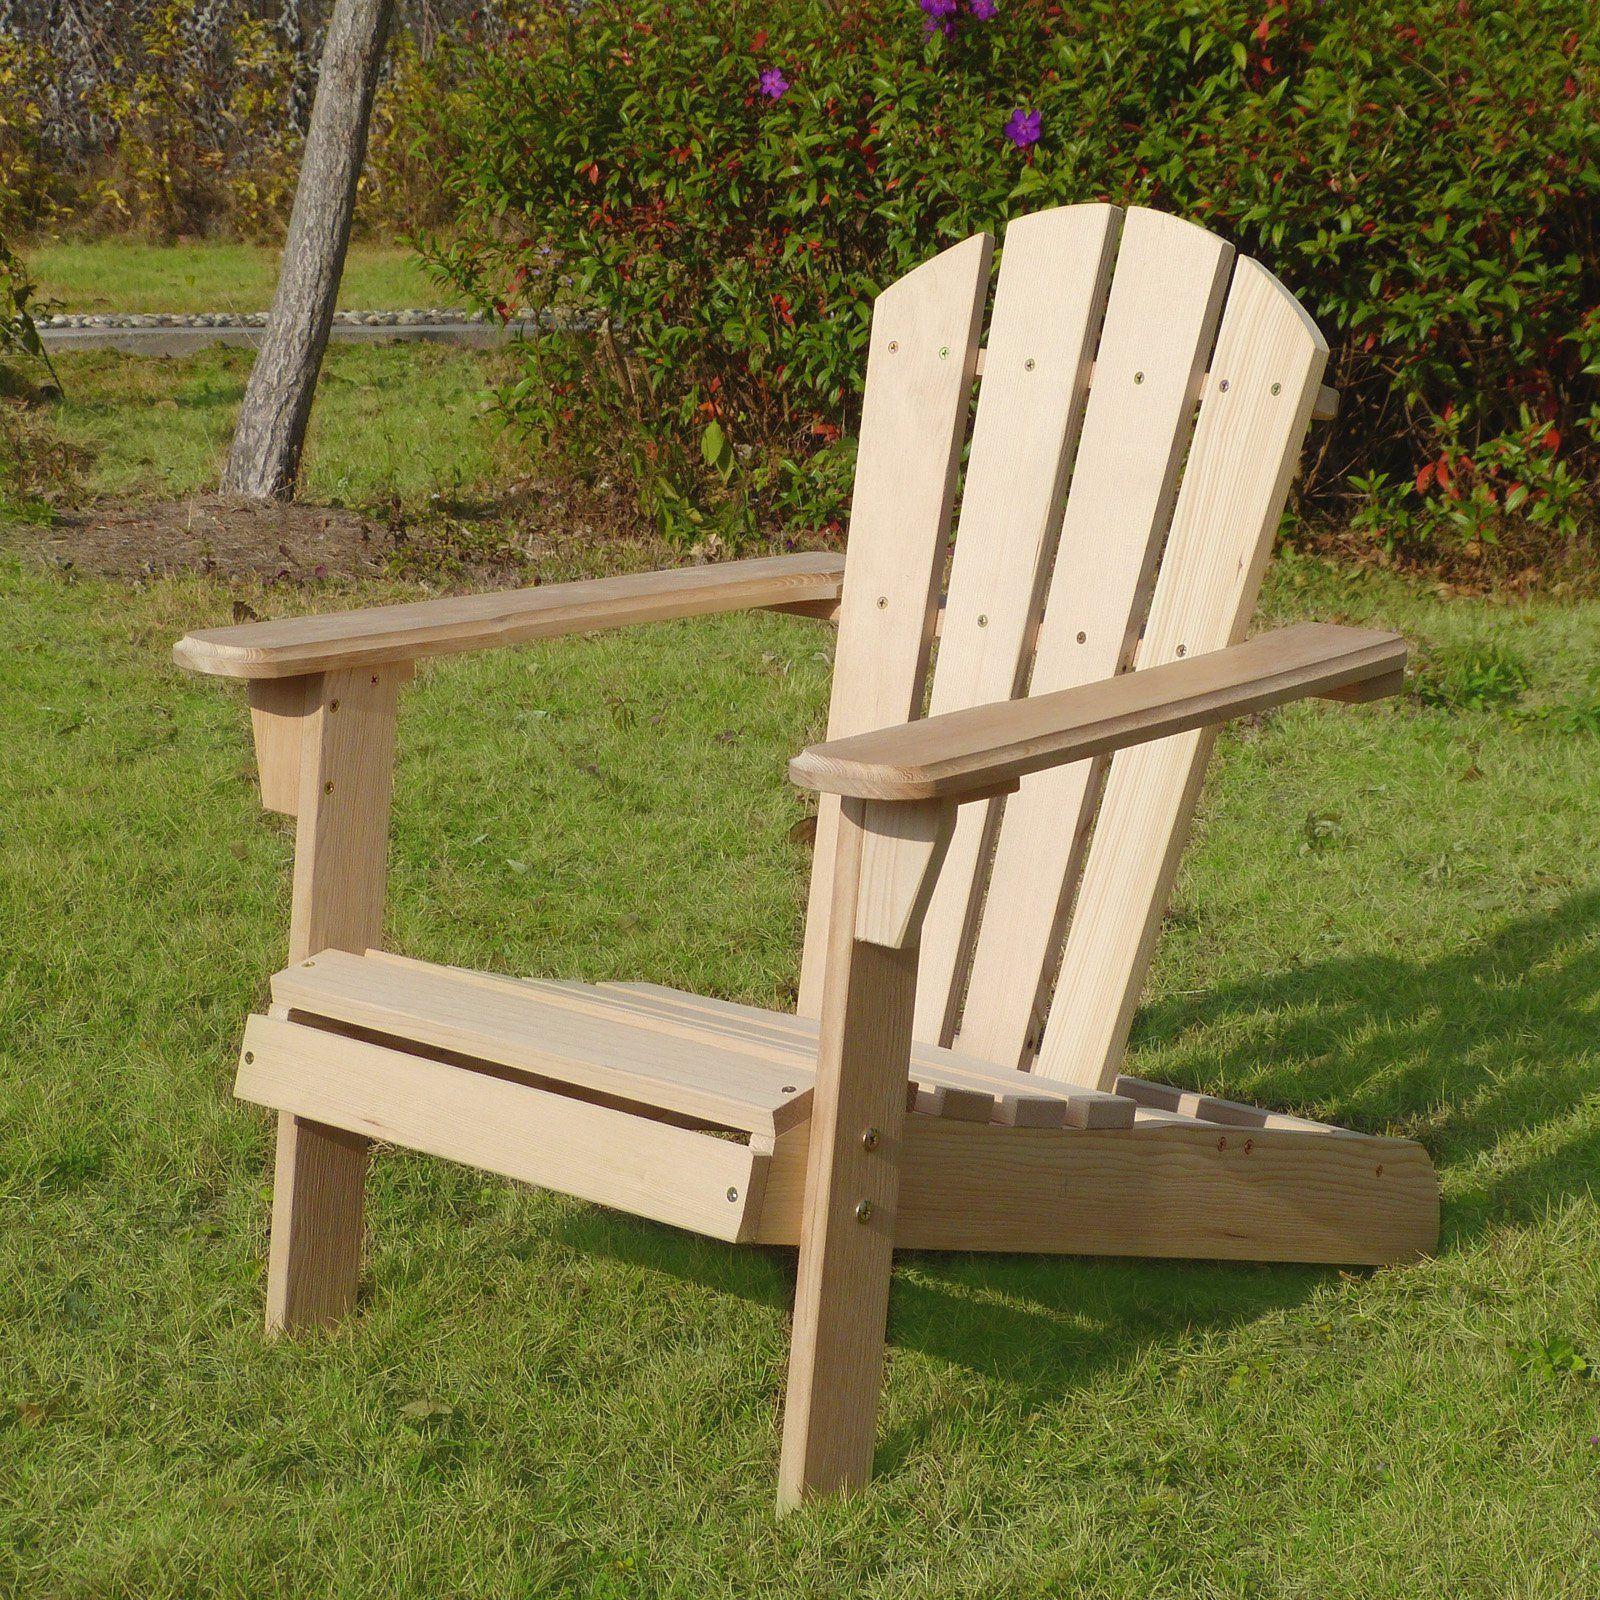 Outdoor Merry Products Kids Adirondack Chair Kit Kids Adirondack